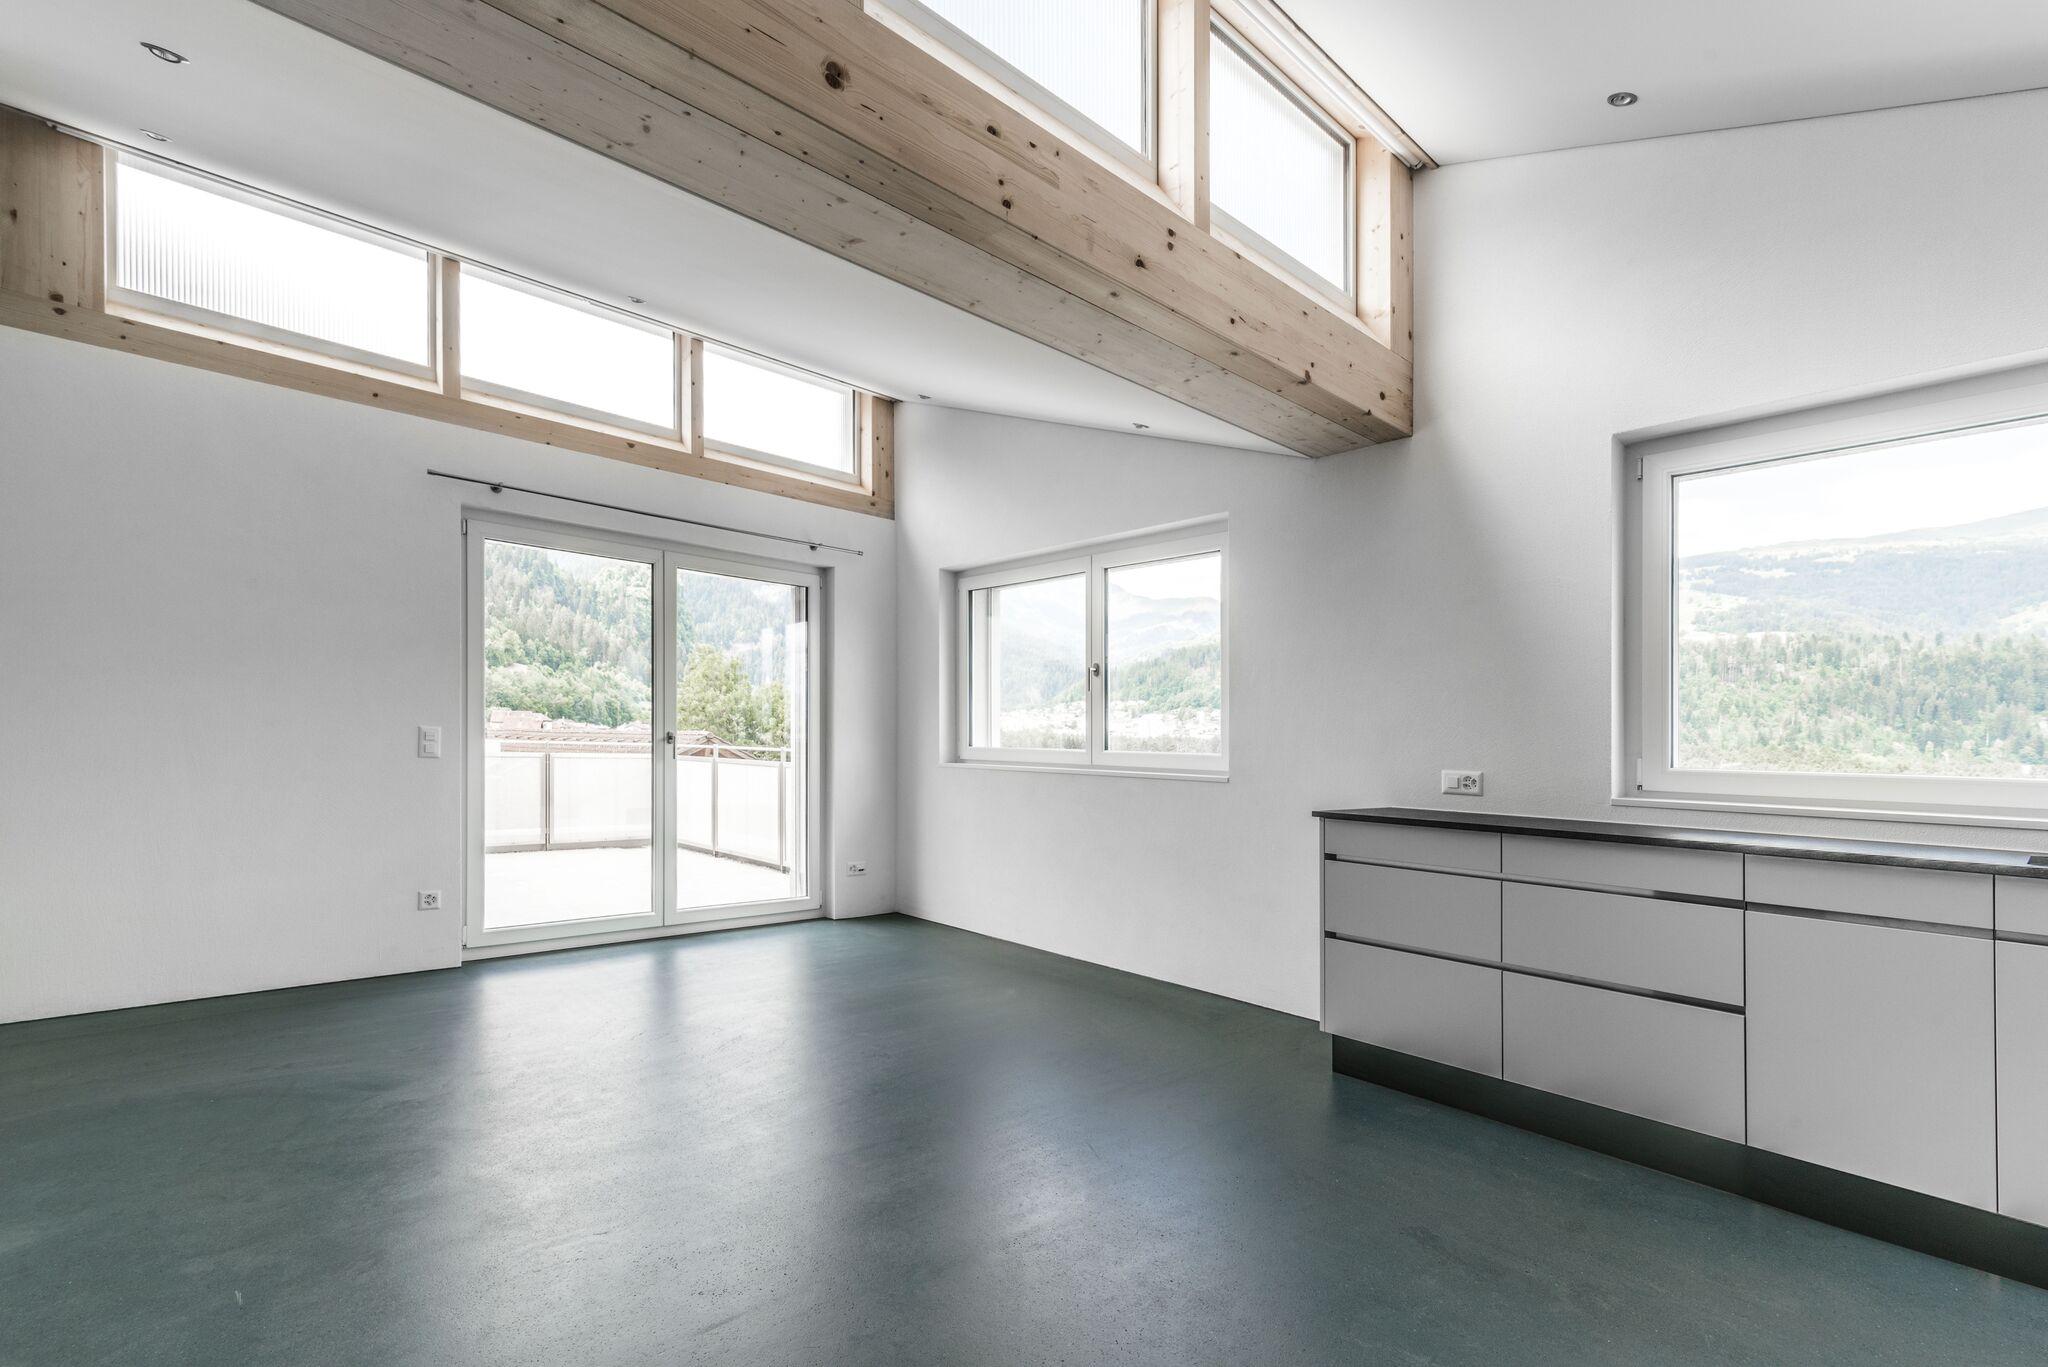 bodenbeschichtung schweiz beschichtungen f r ihre b den. Black Bedroom Furniture Sets. Home Design Ideas